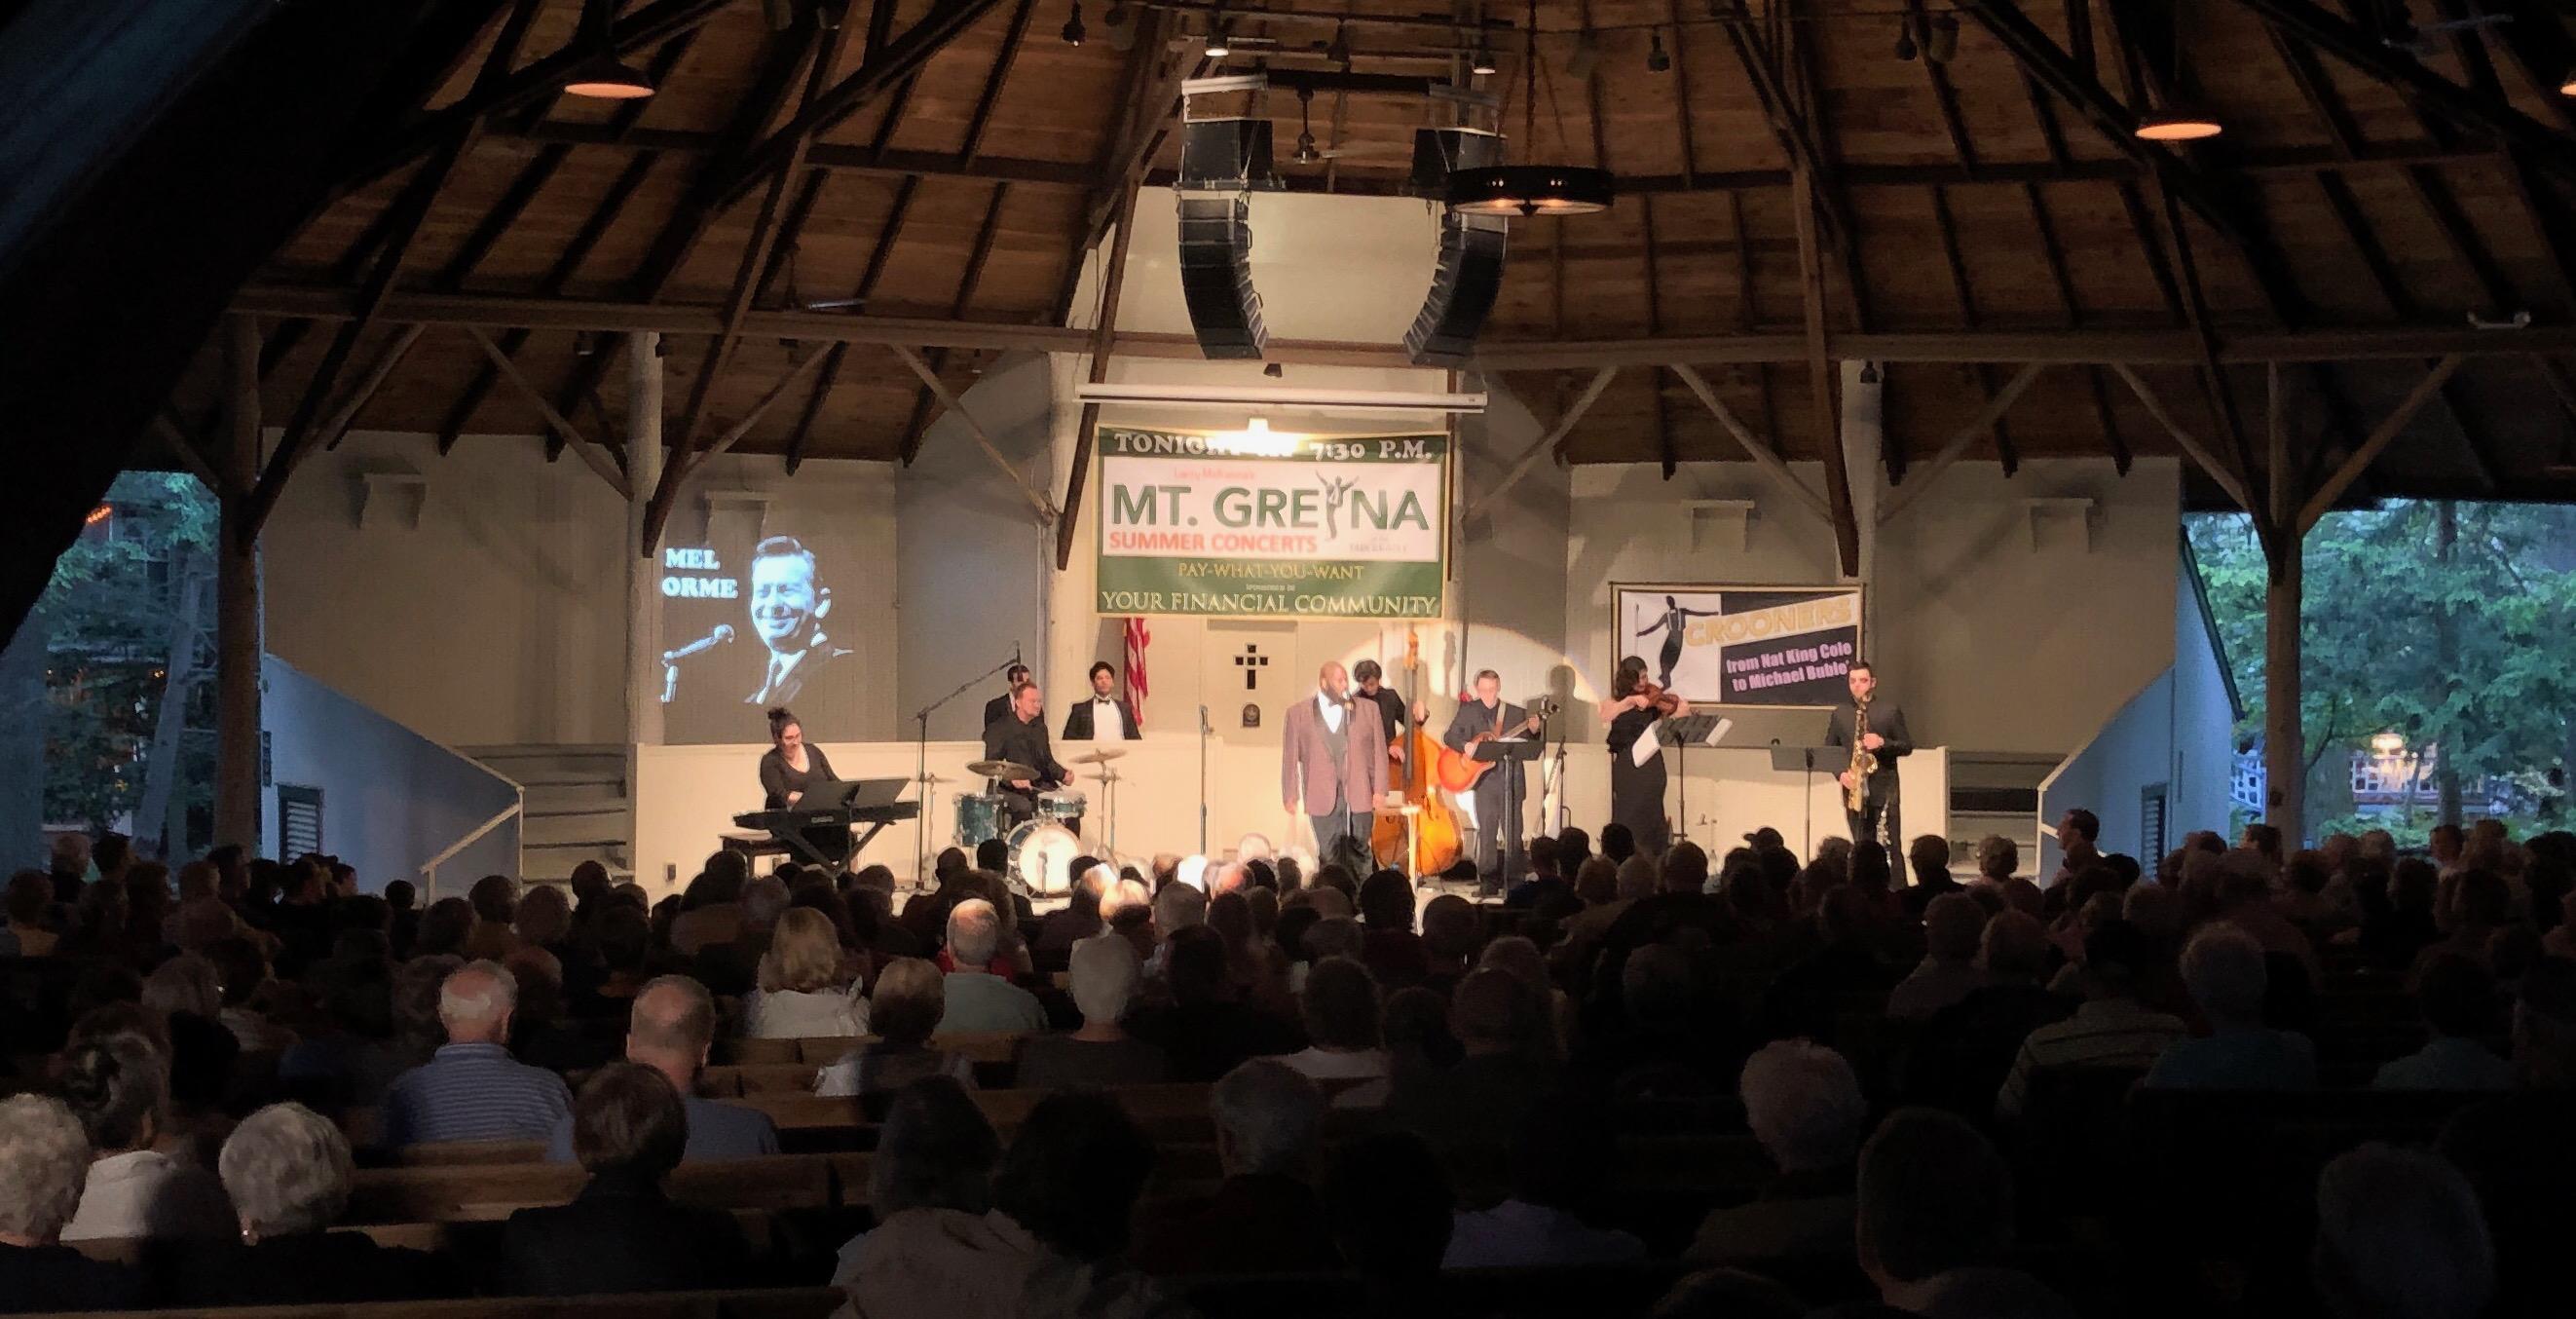 Timbers Mt Gretna Christmas 2021 Larry Mckenna Mt Gretna Summer Concerts